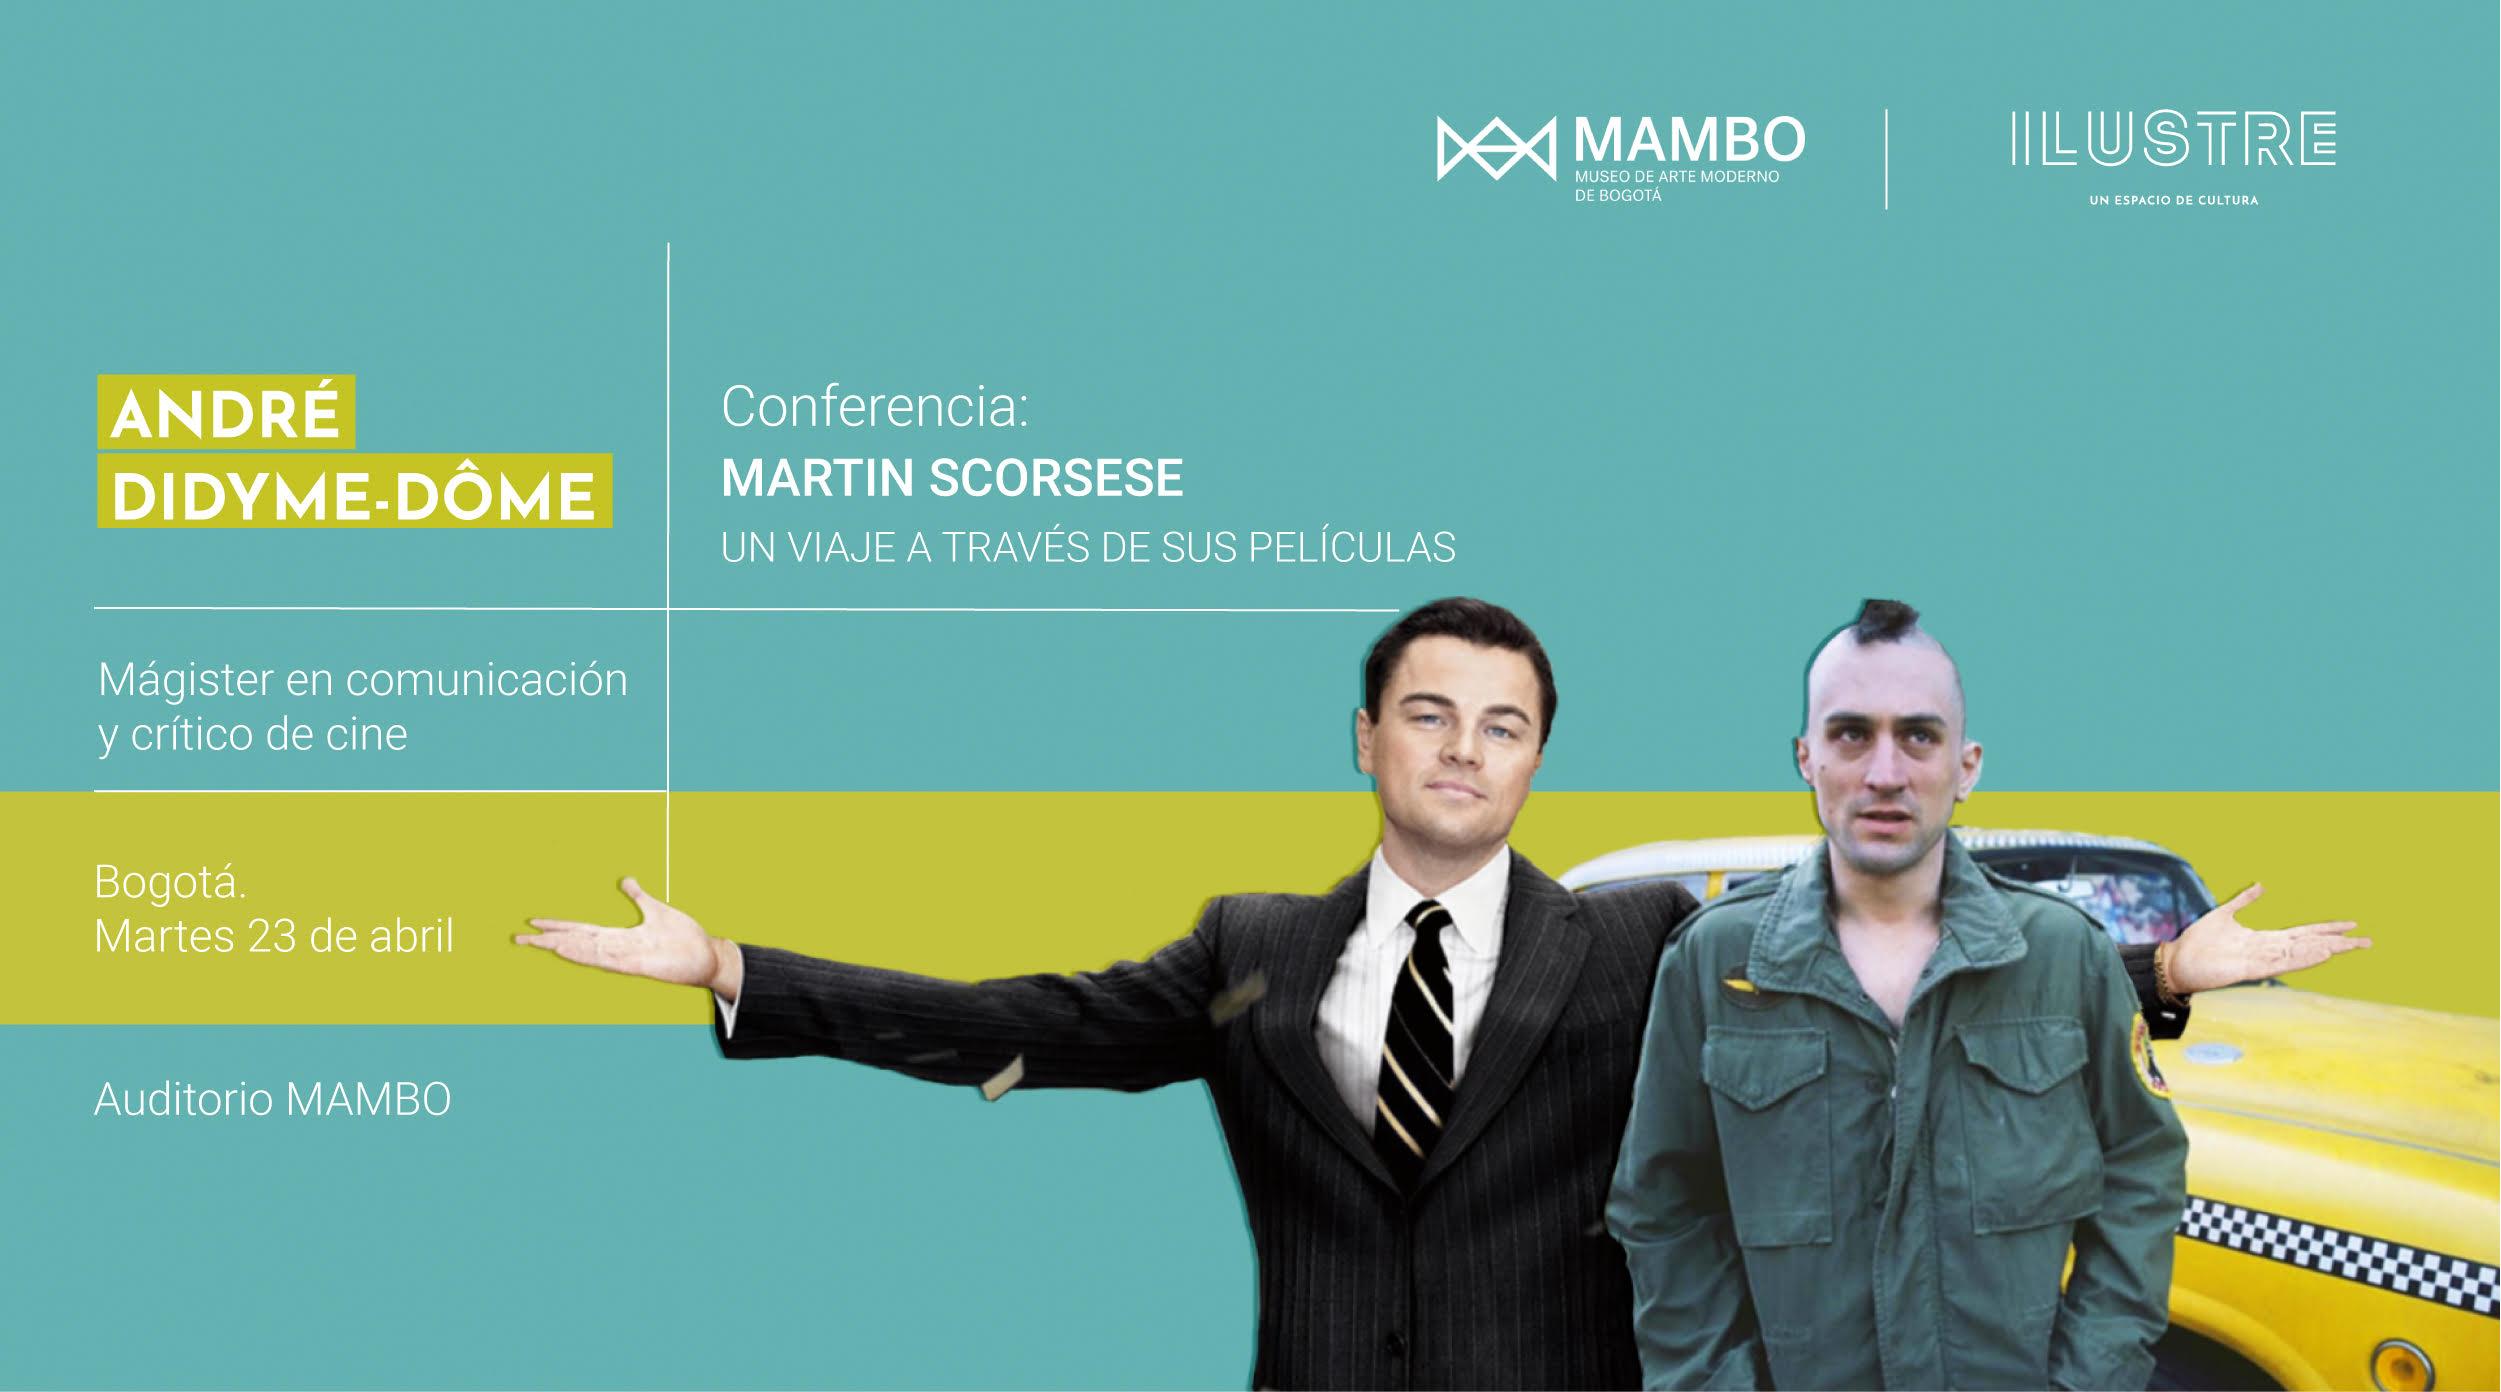 Martin Scorsese: Un viaje a través de sus películas